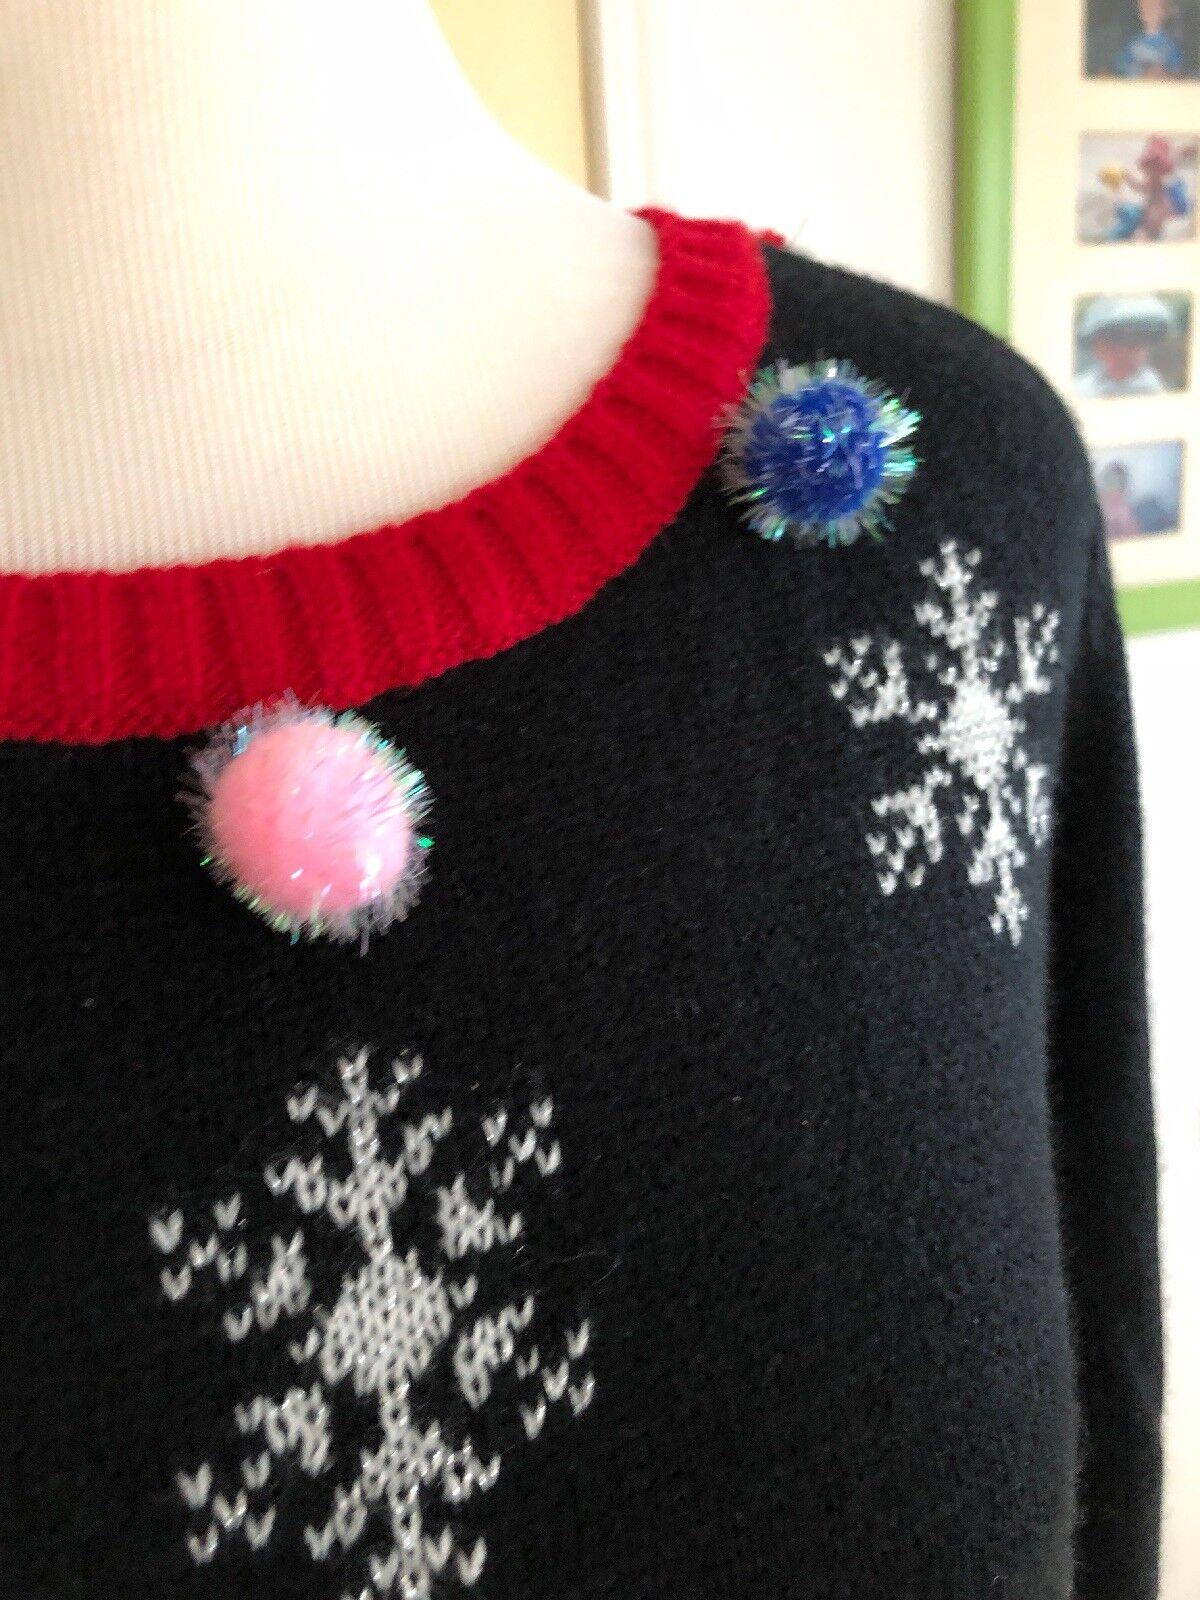 33Degrees Llama Llama Llama Ugly Christmas Sweater Size M Epic Ugly 8eb1e8